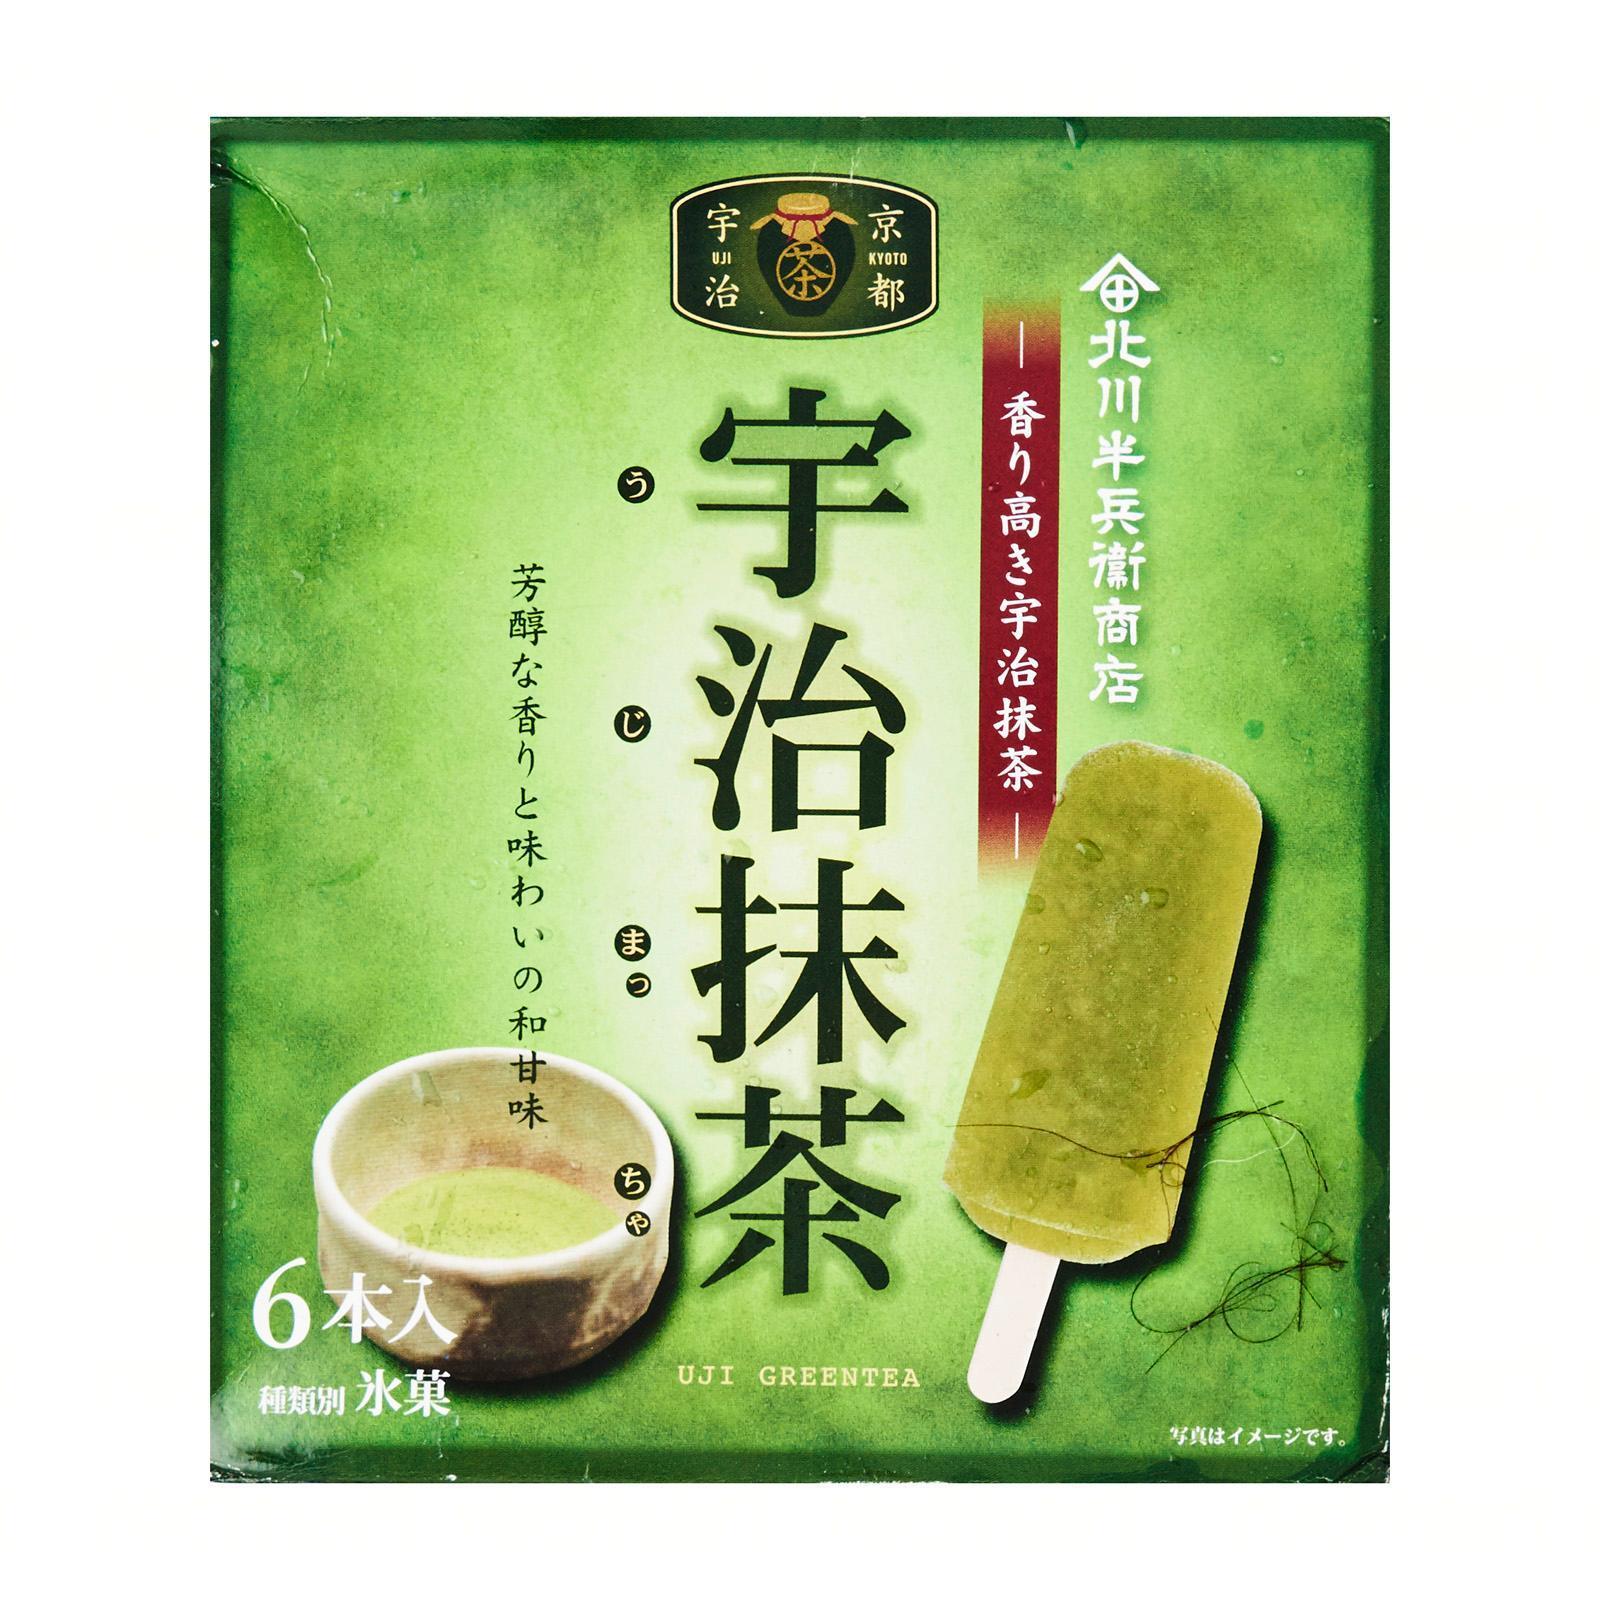 Toyo Uji Matcha Green Tea Ice Bar - Frozen